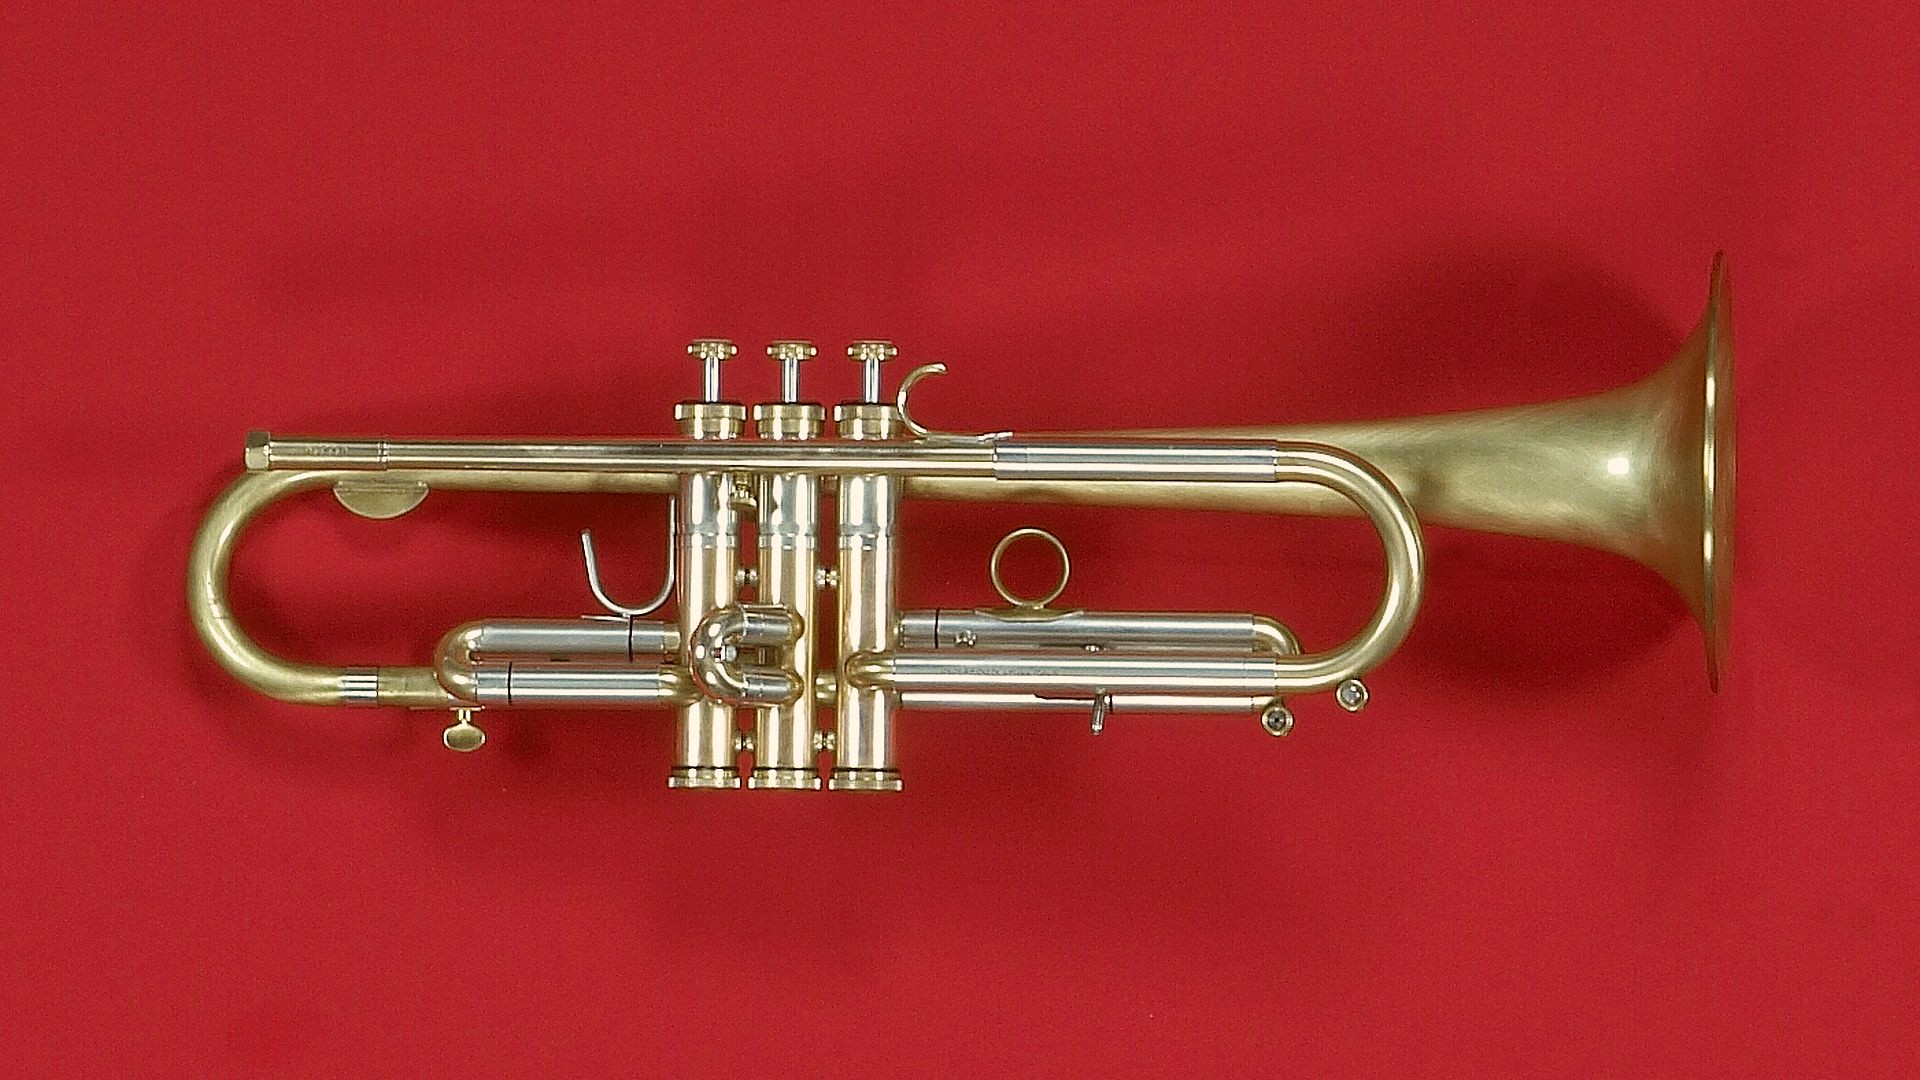 trompete_amarone471_1920x1080px